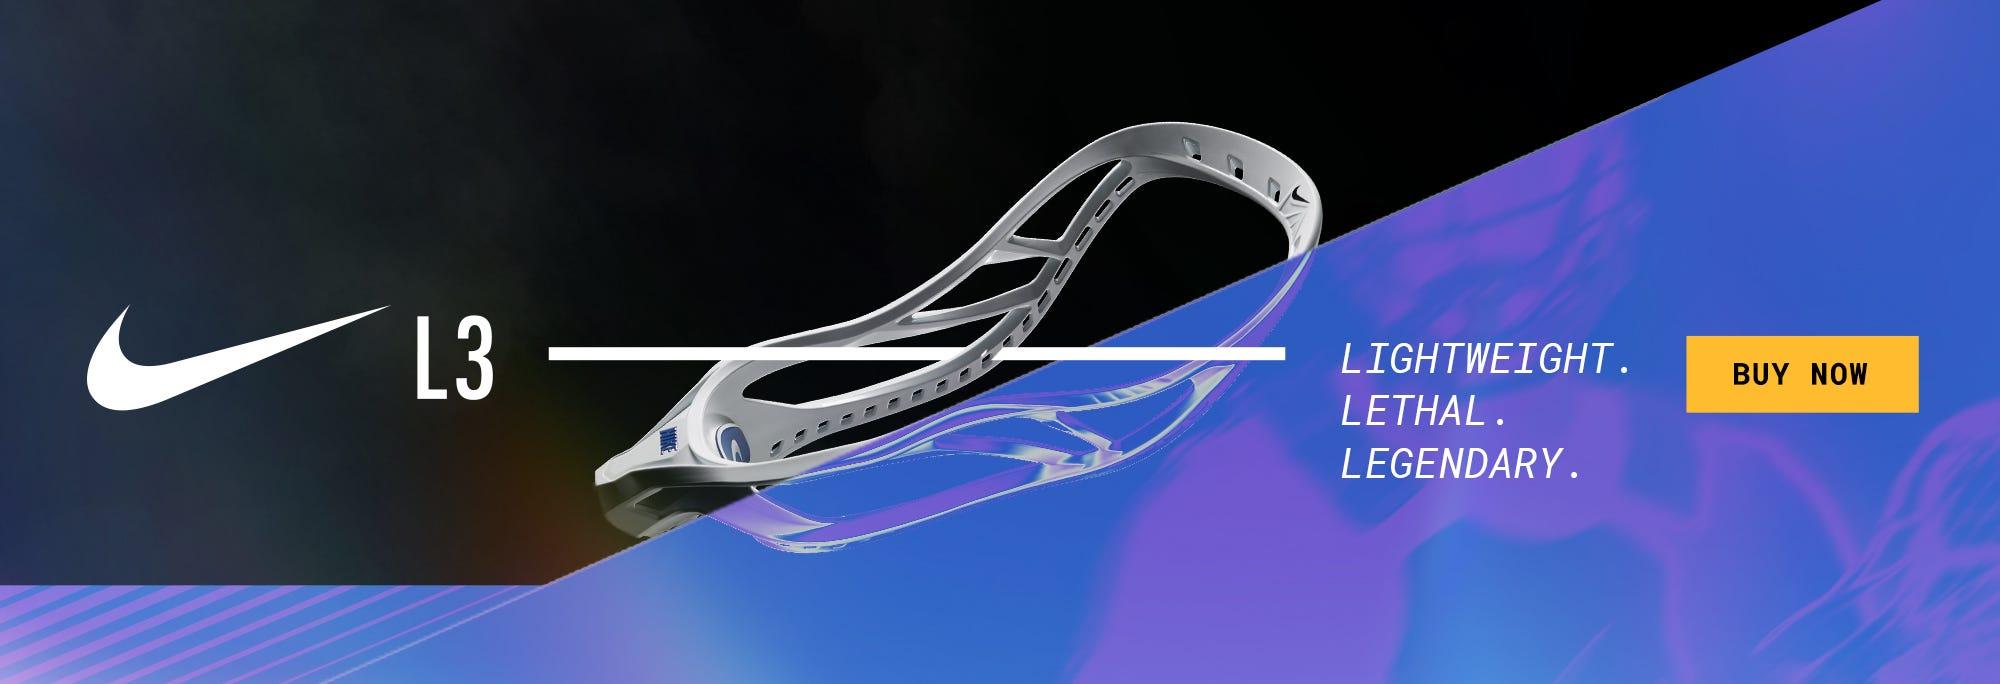 Nike Lakota 3 - DESKTOP